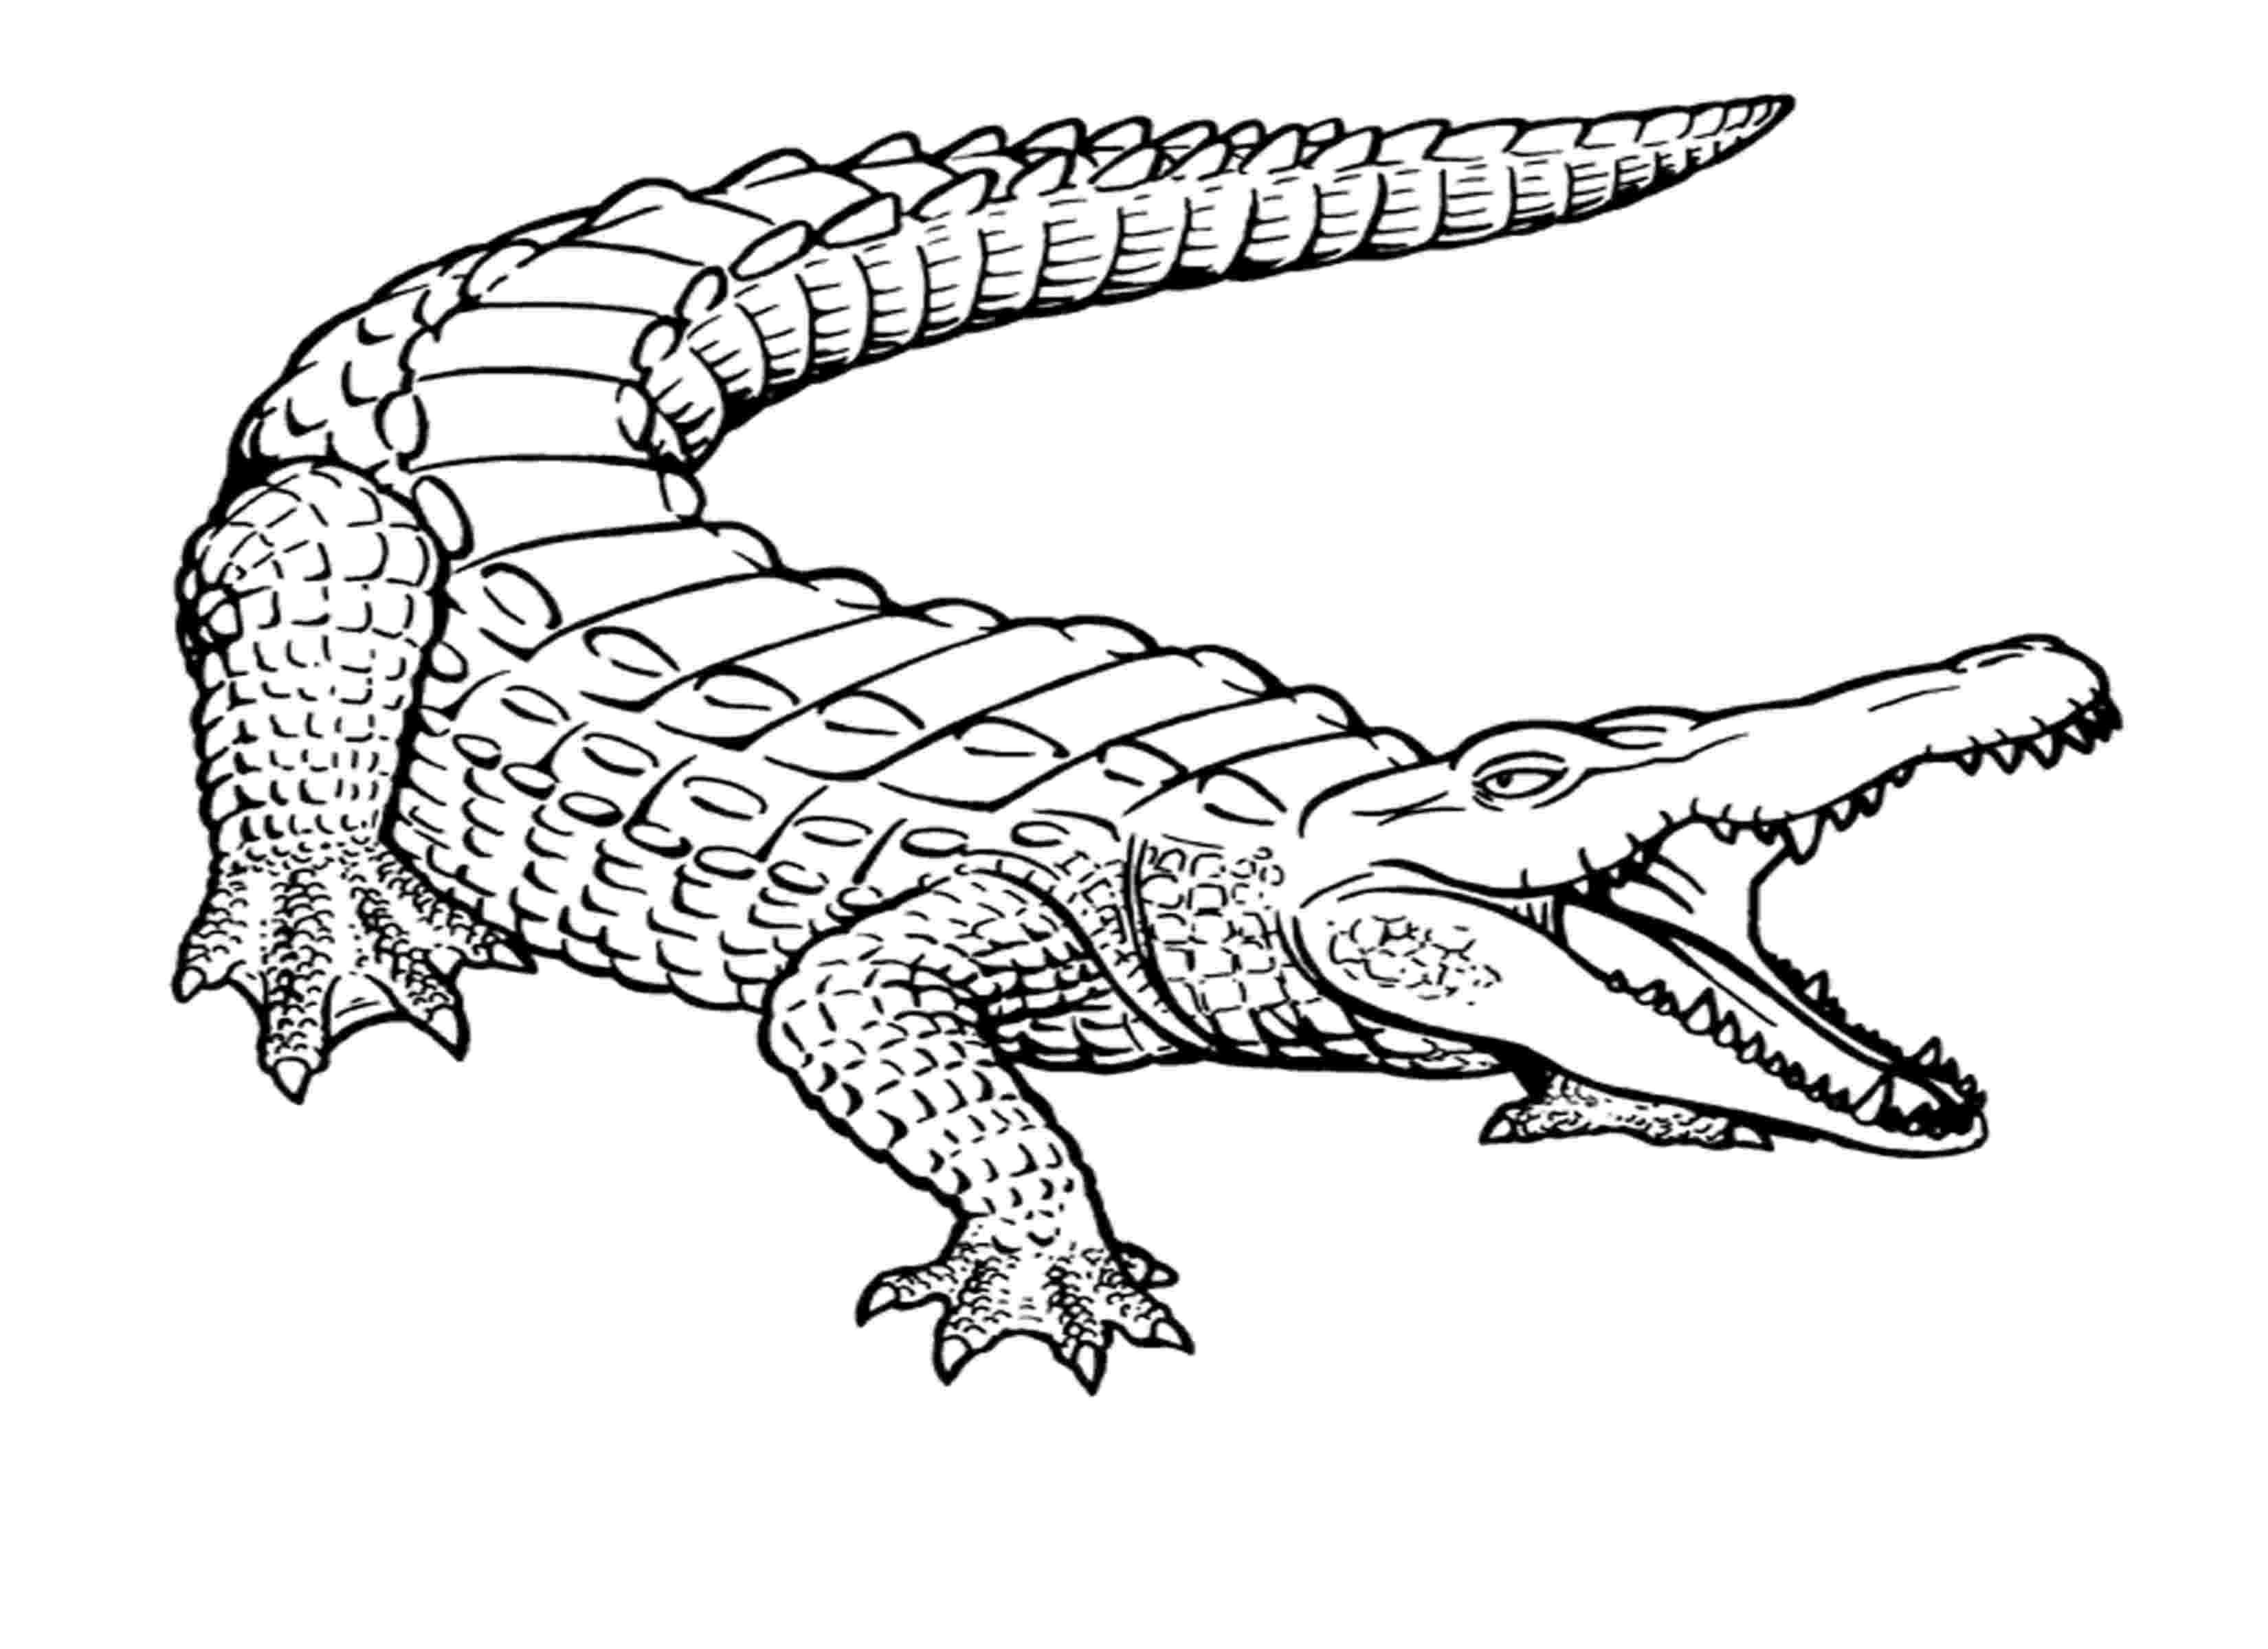 crocodile coloring free printable crocodile coloring pages for kids coloring crocodile